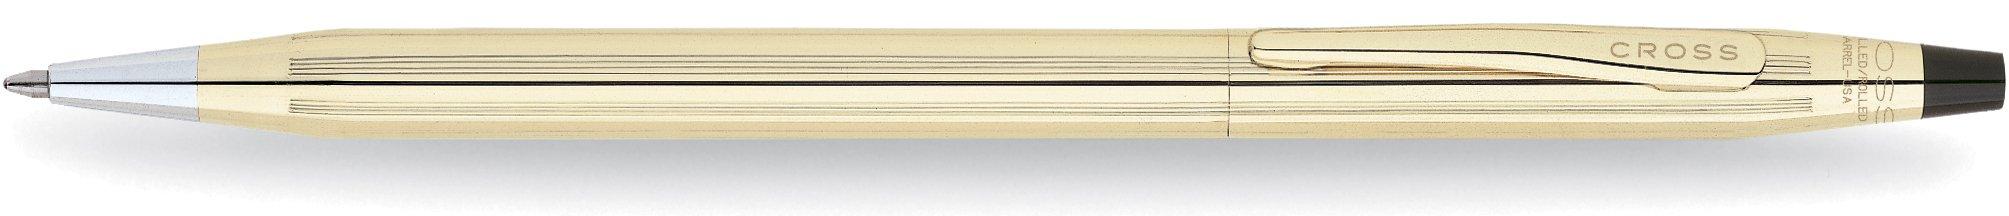 Cross Classic Century 10KT Gold-Filled (Rolled Gold) Ballpoint Pen